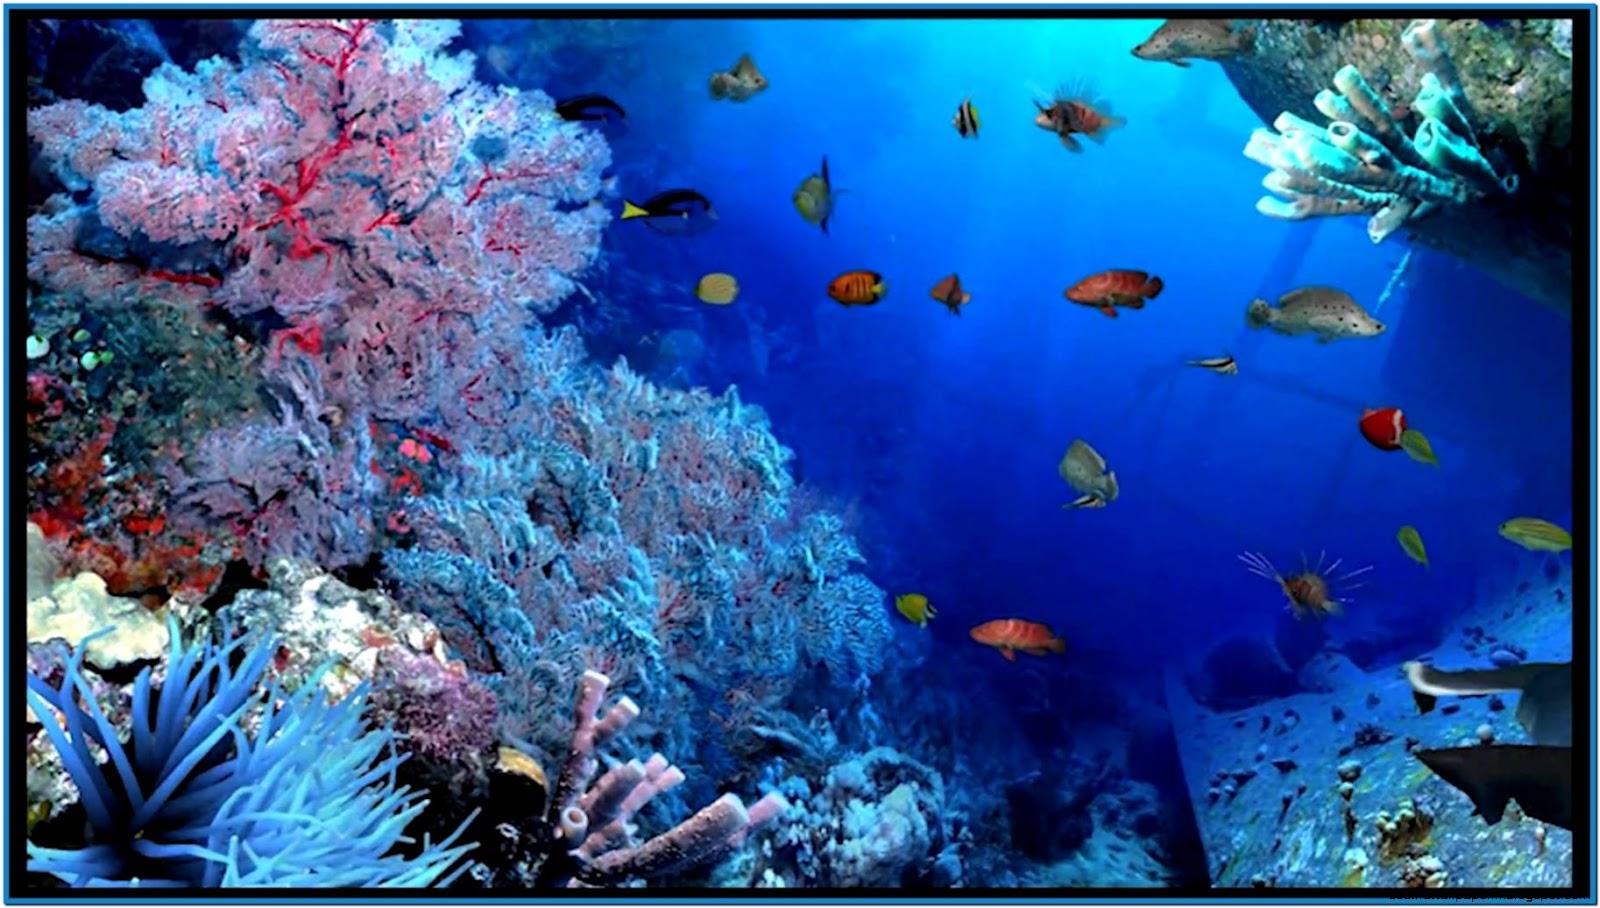 Aquarium screensavers 3d wallpaper best hd wallpapers - Anime screensaver windows 10 ...